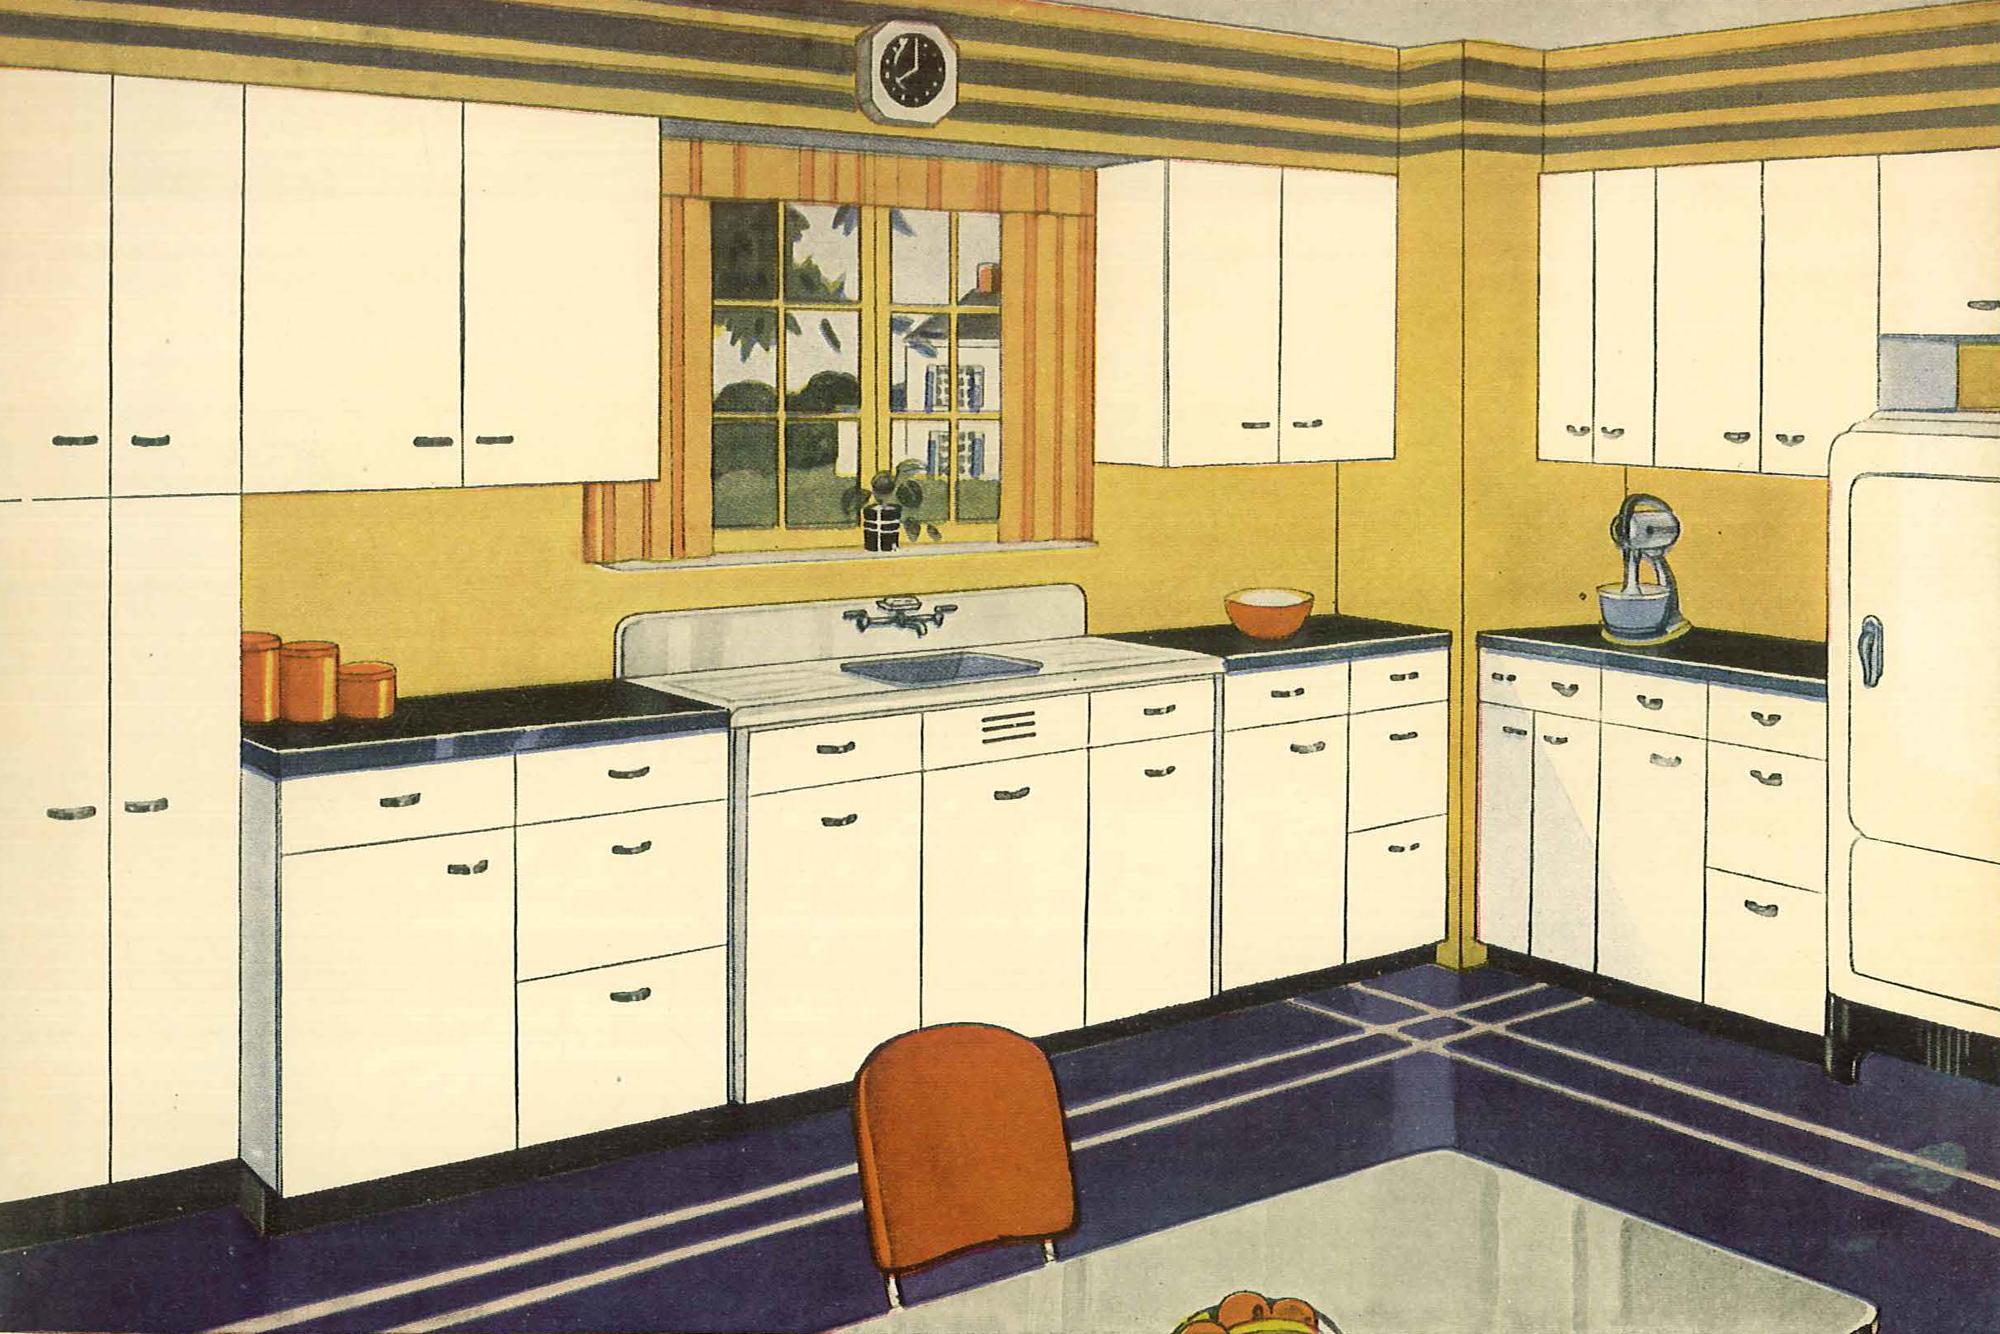 The Rise Of The Modern Kitchen Architect Magazine